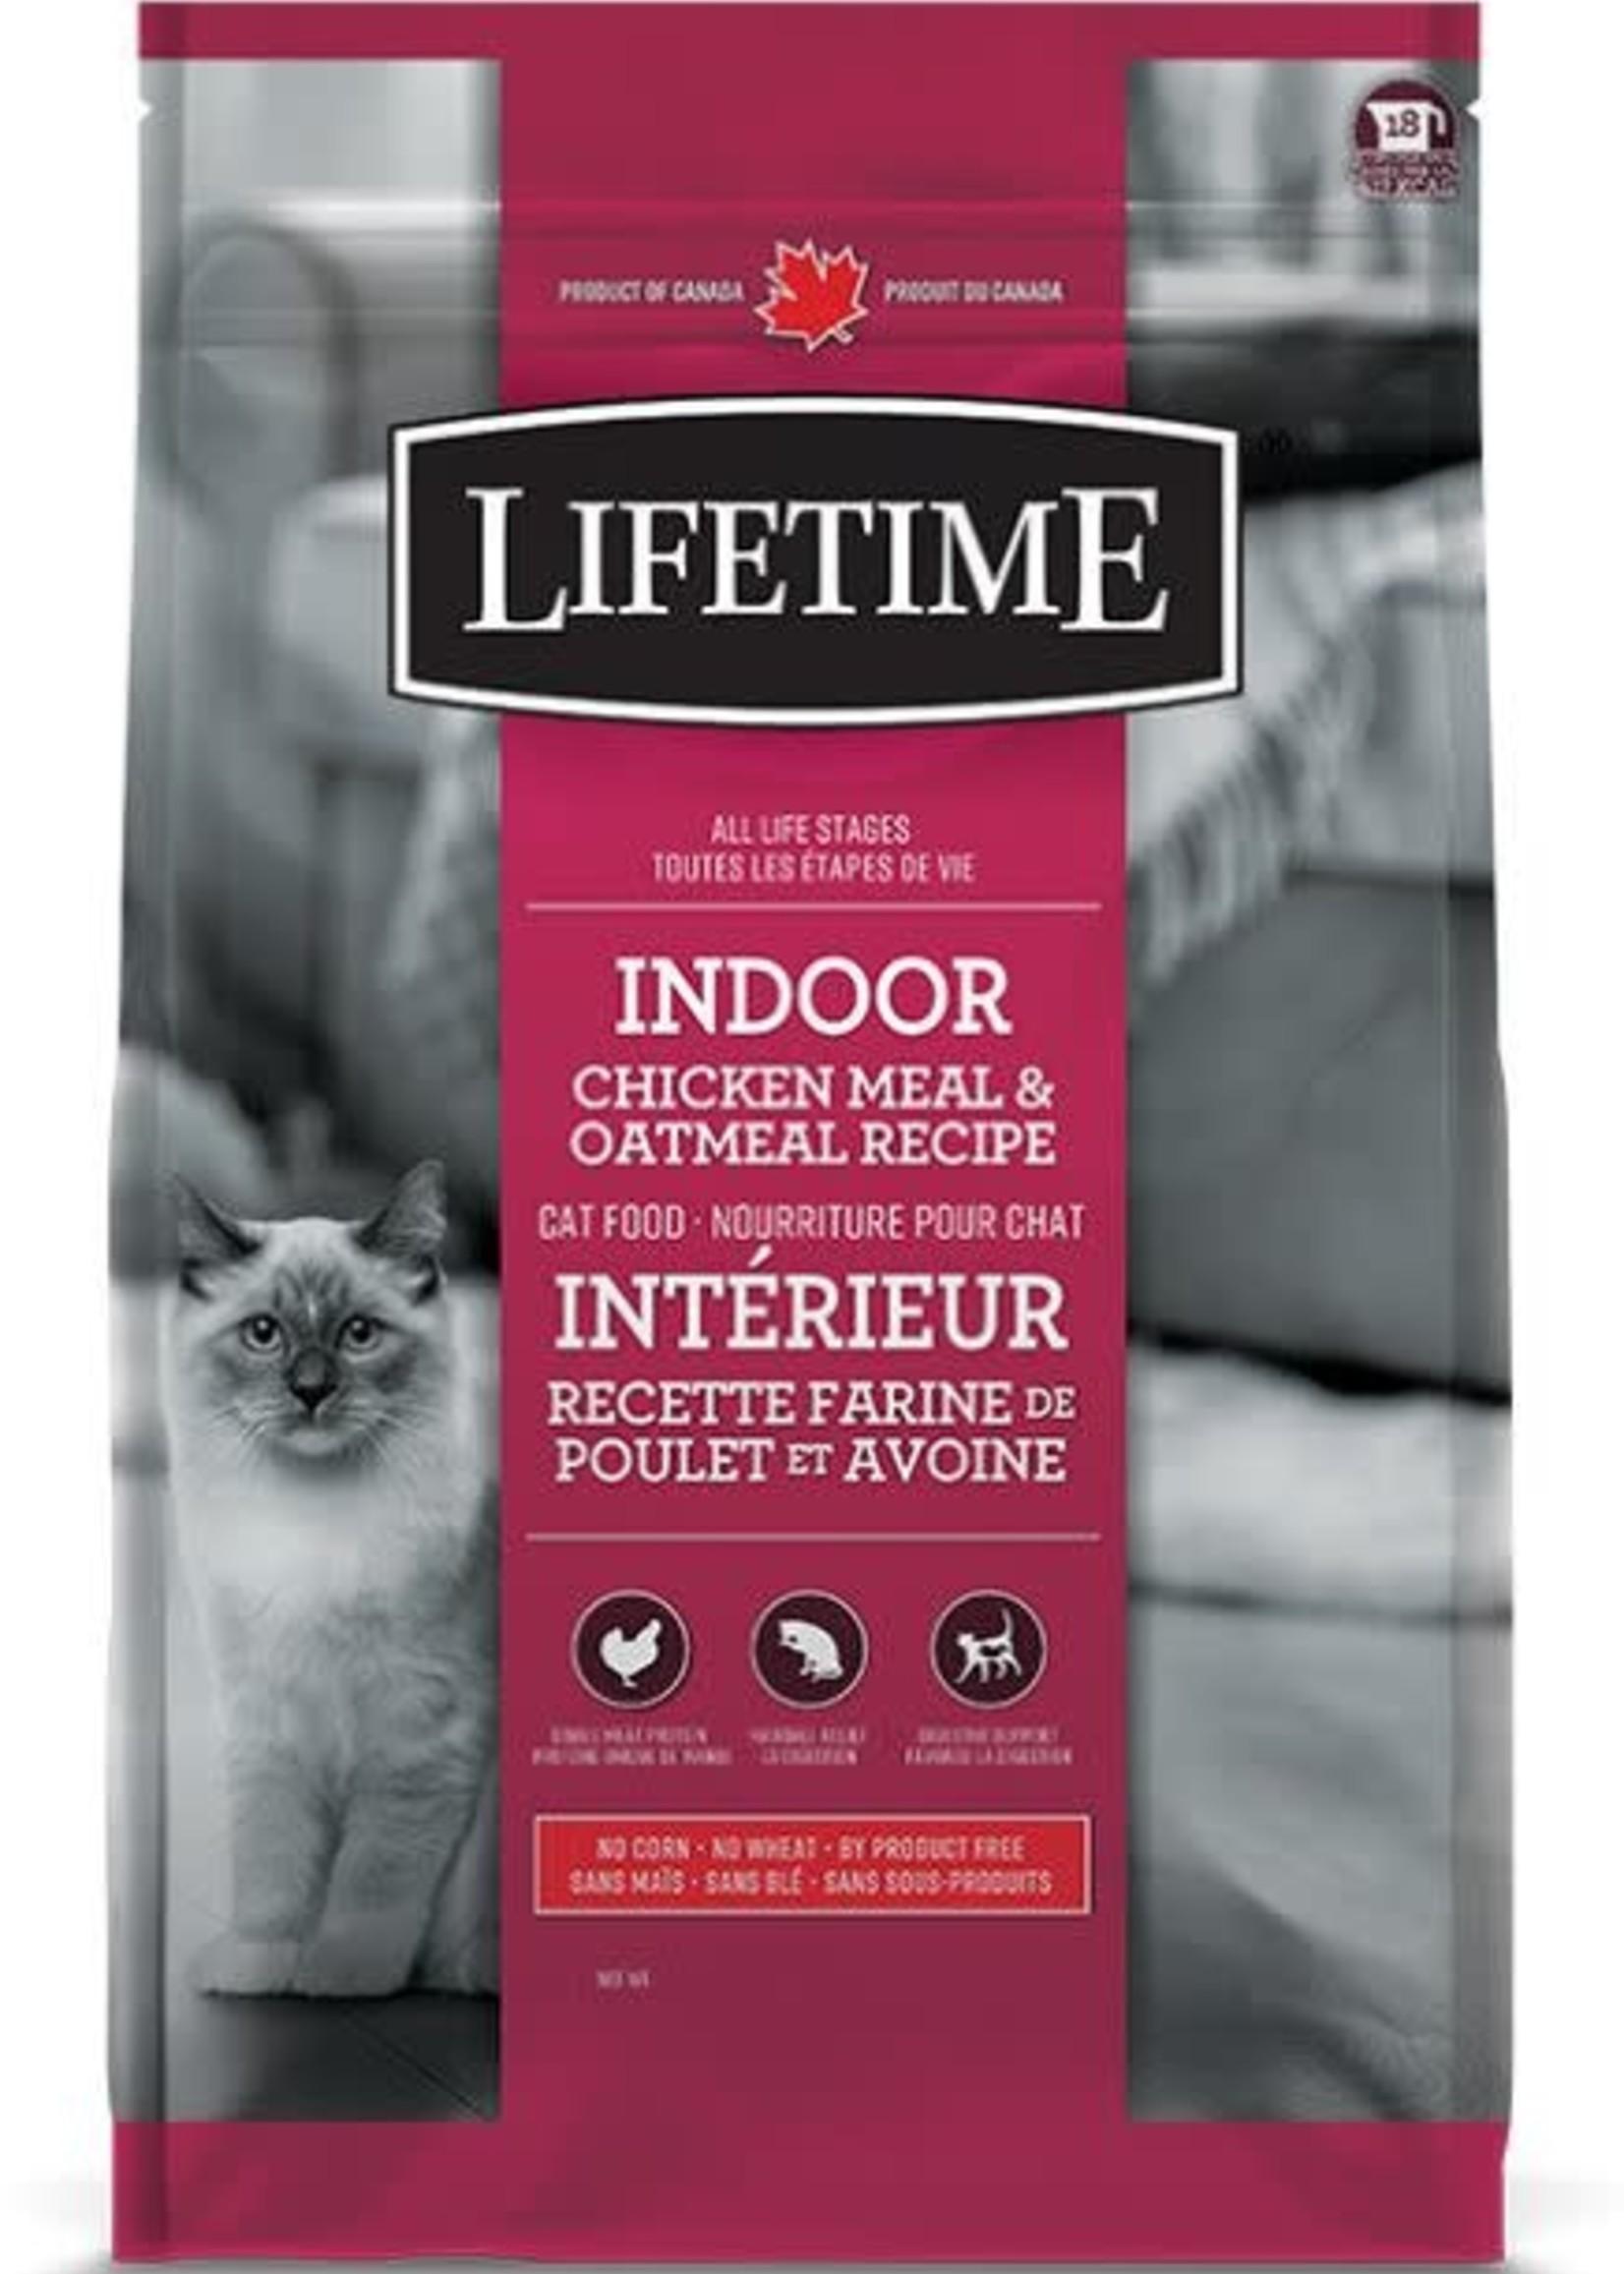 LifeTime® LifeTime Indoor Chicken Meal & Oatmeal Recipe 14lbs